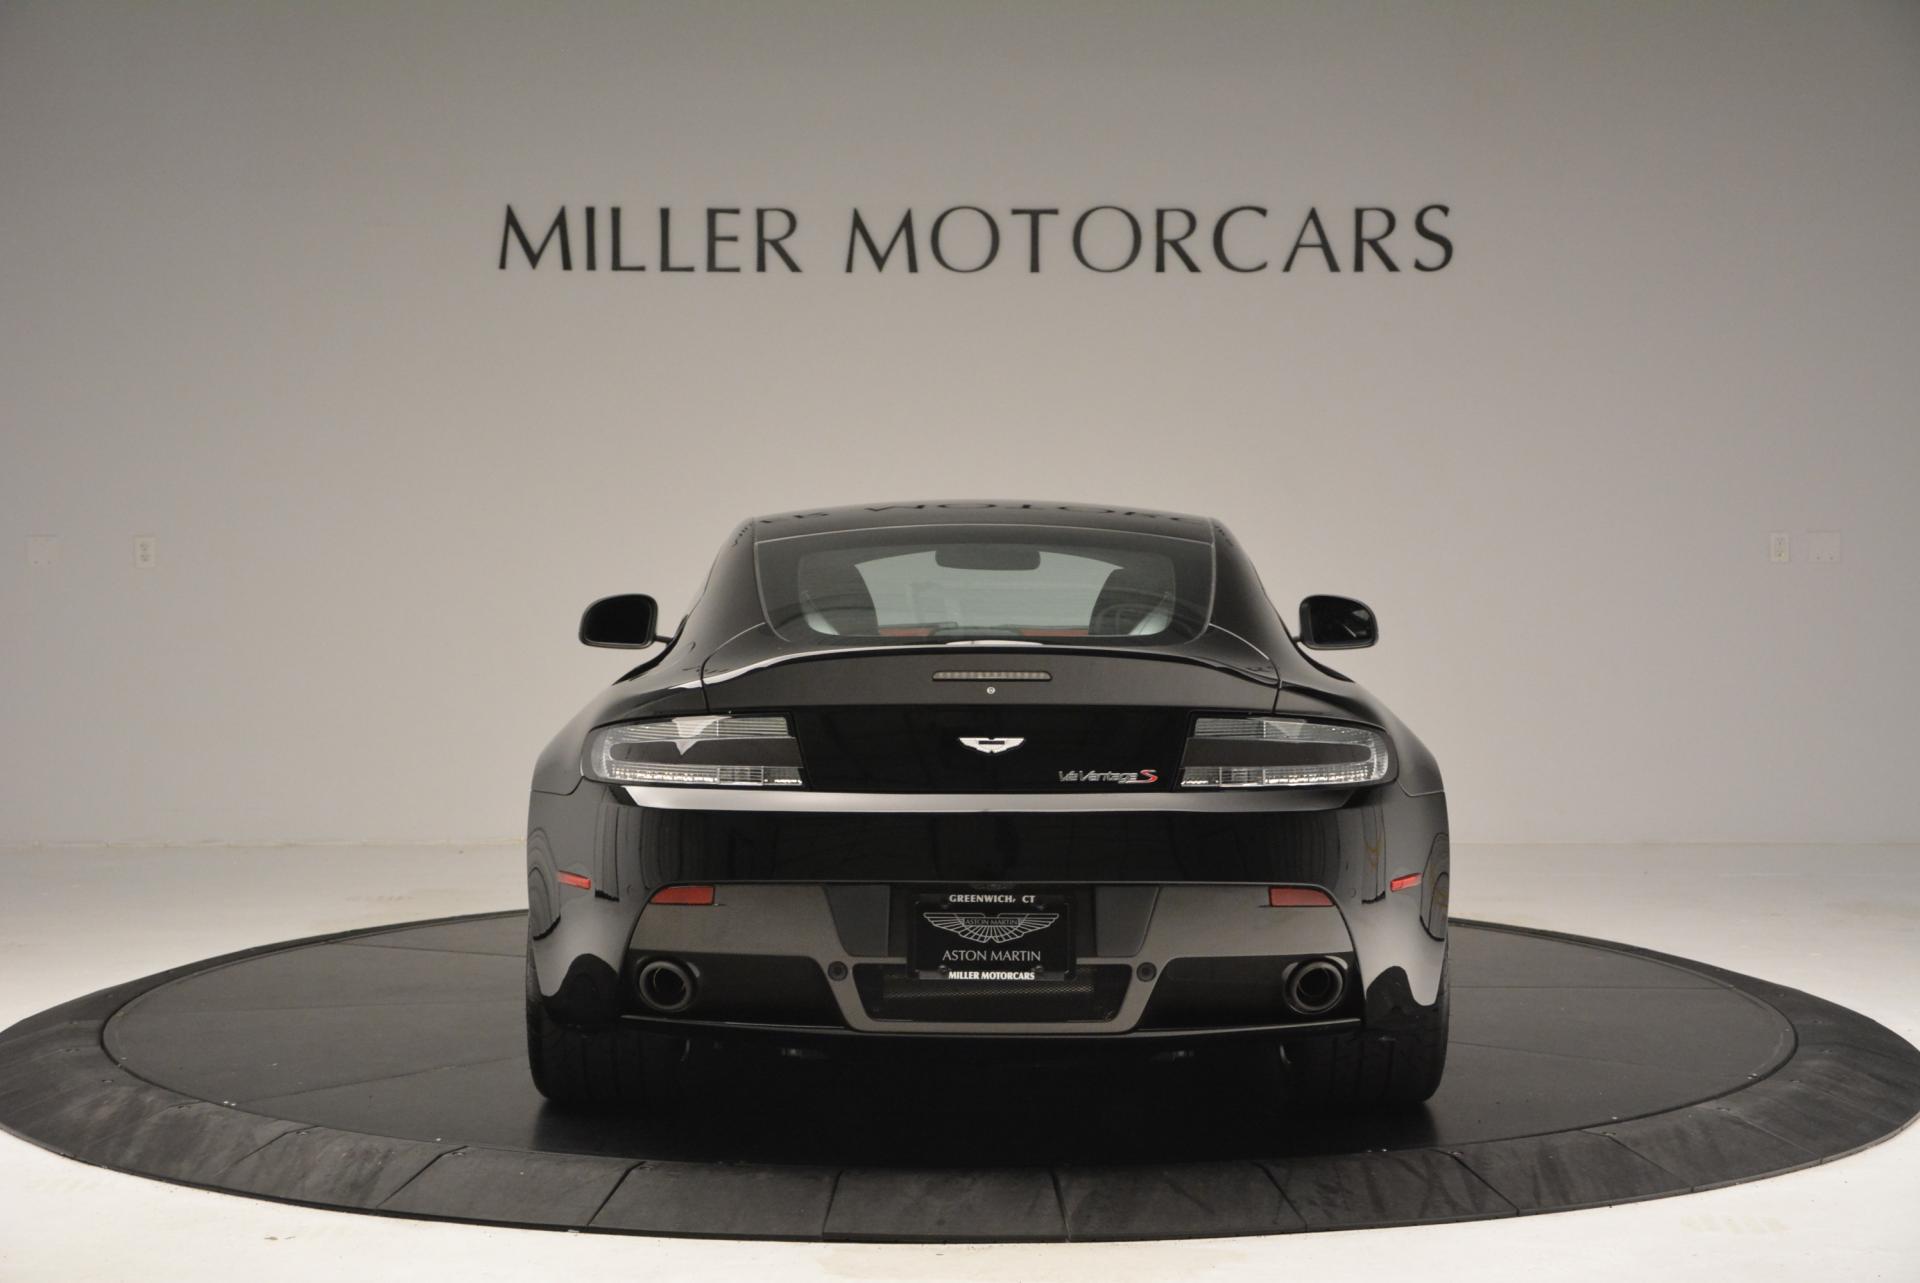 New 2015 Aston Martin V12 Vantage S  For Sale In Greenwich, CT 103_p6